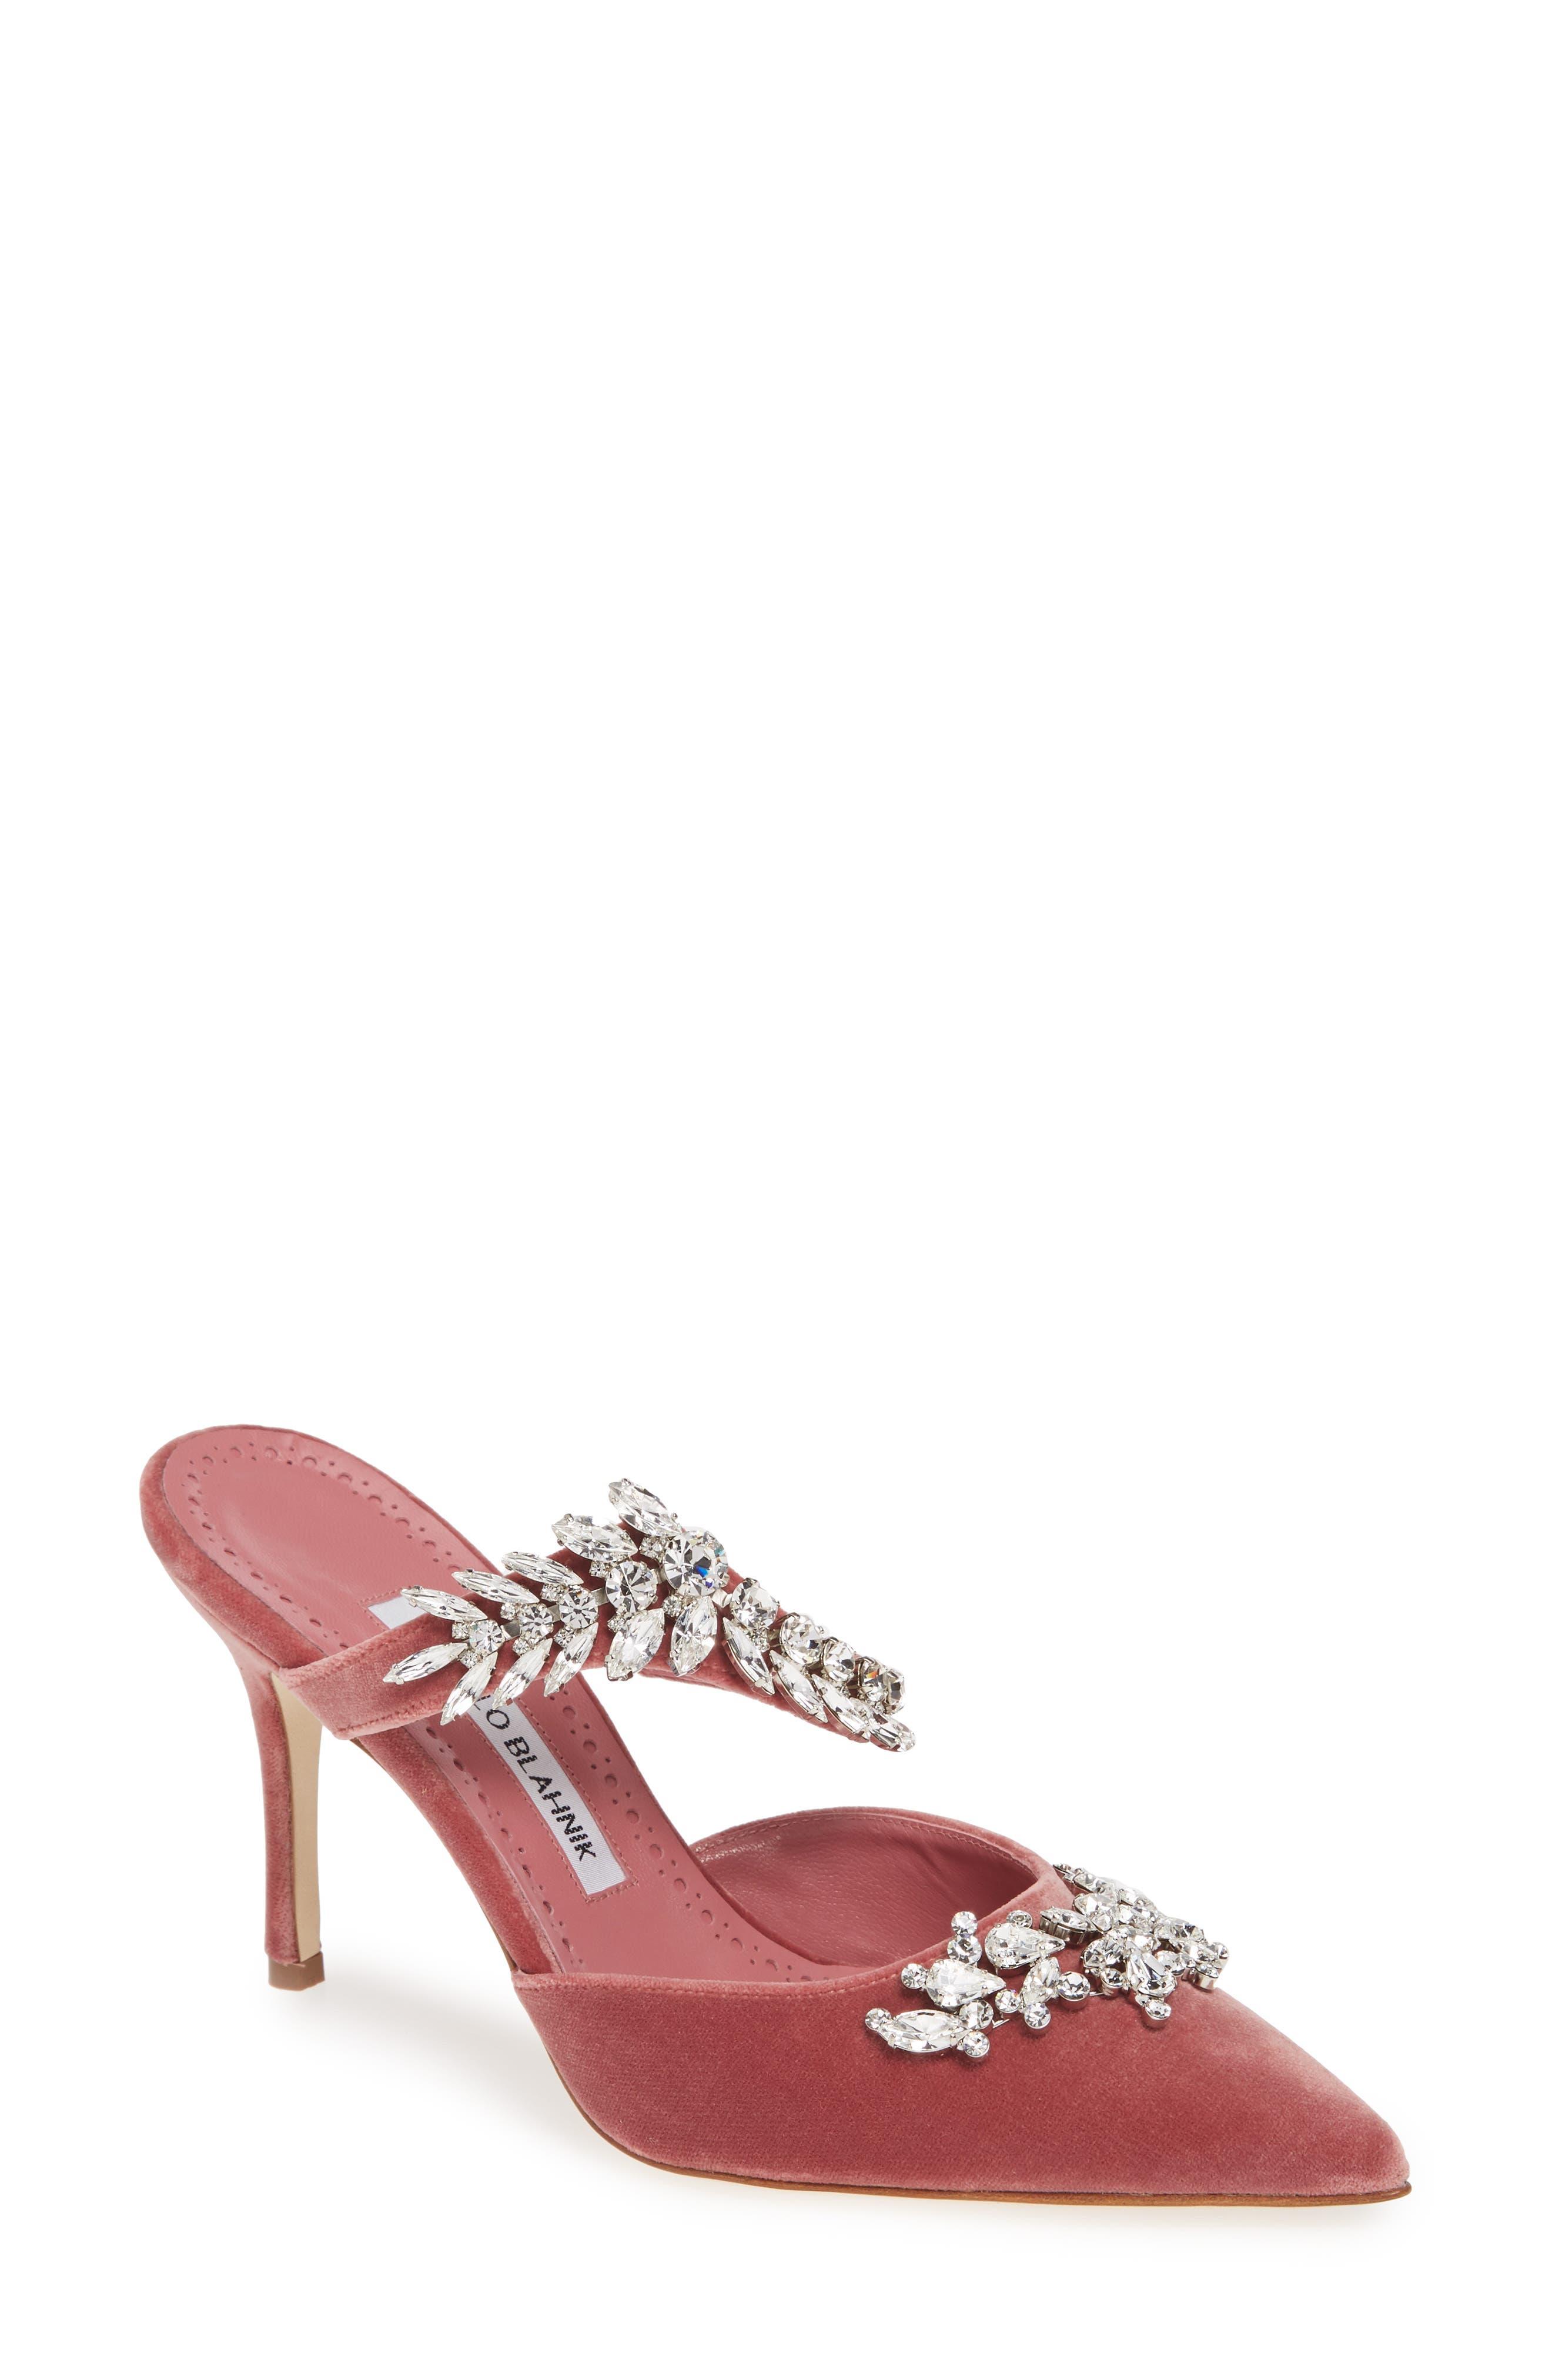 8b0bd1ddb0210 manolo blahnik mules sandals for women - Buy best women's manolo blahnik  mules sandals on Cools.com Shop